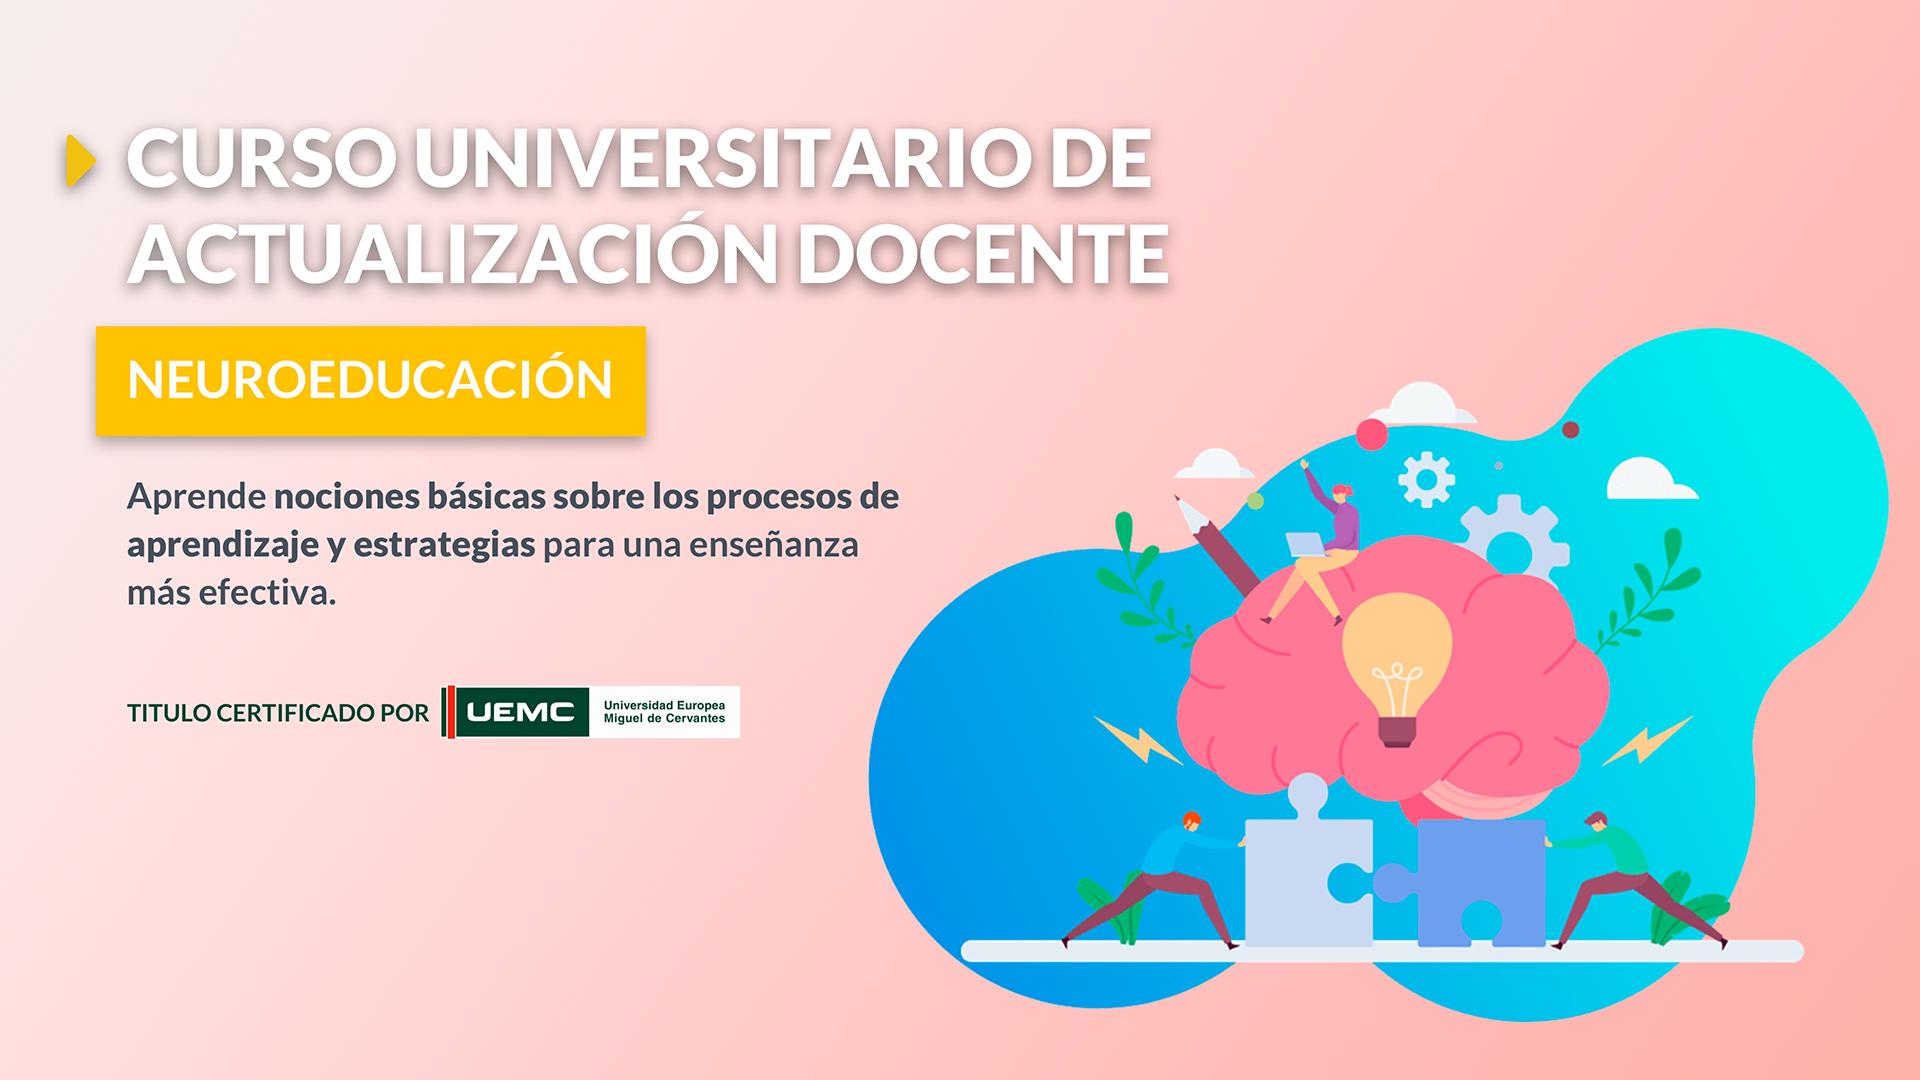 Cursos Universitarios de Actualización Docente: Neuroeducación